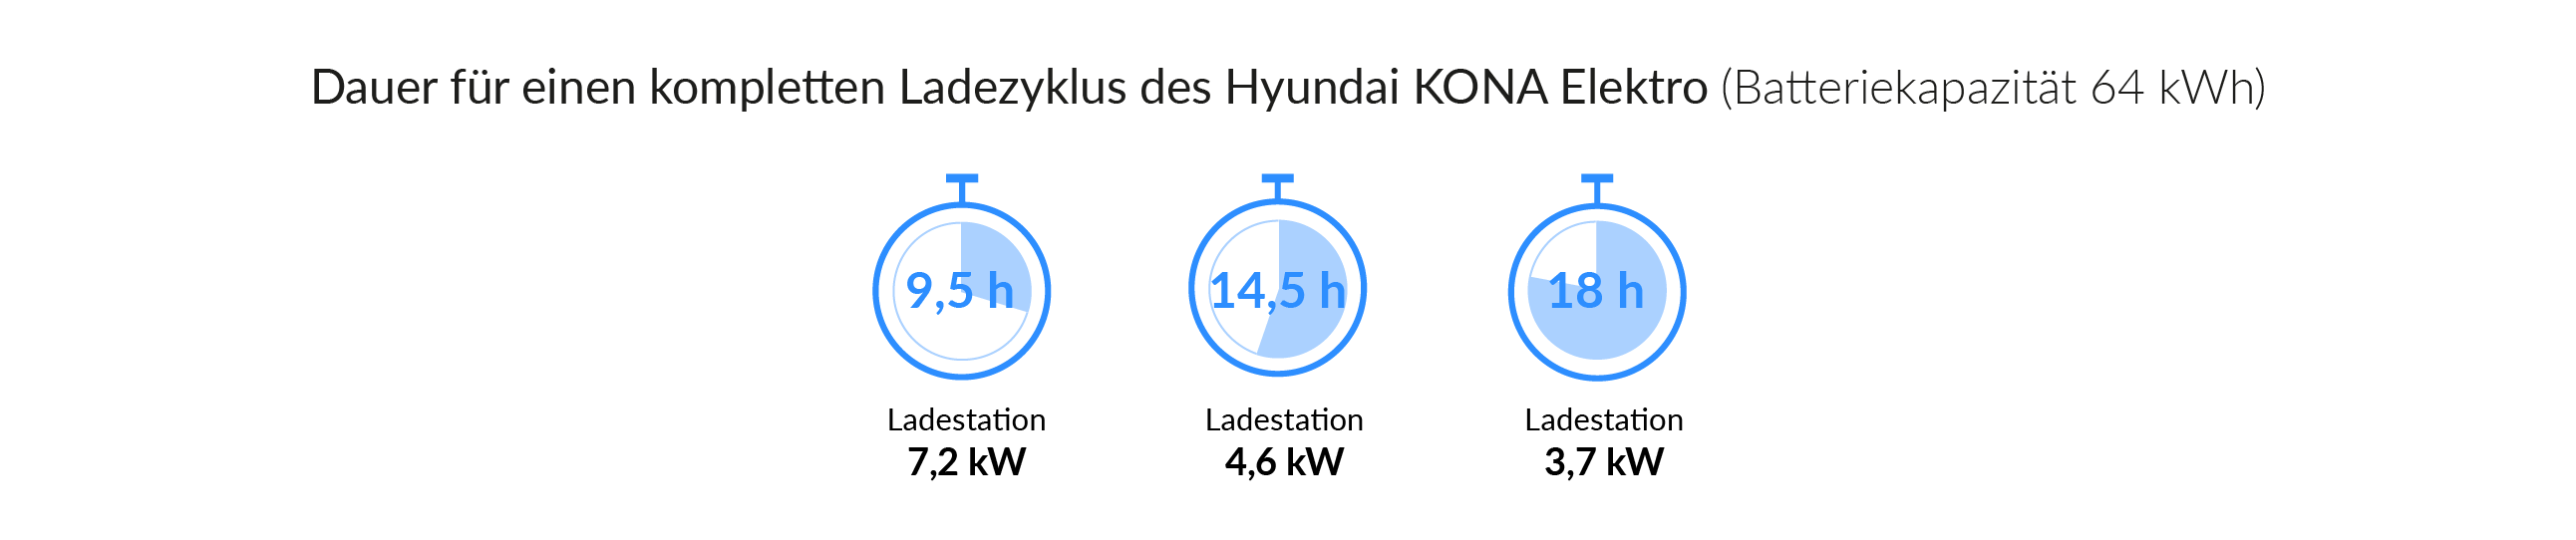 Ladezeiten des Hyundai KONA